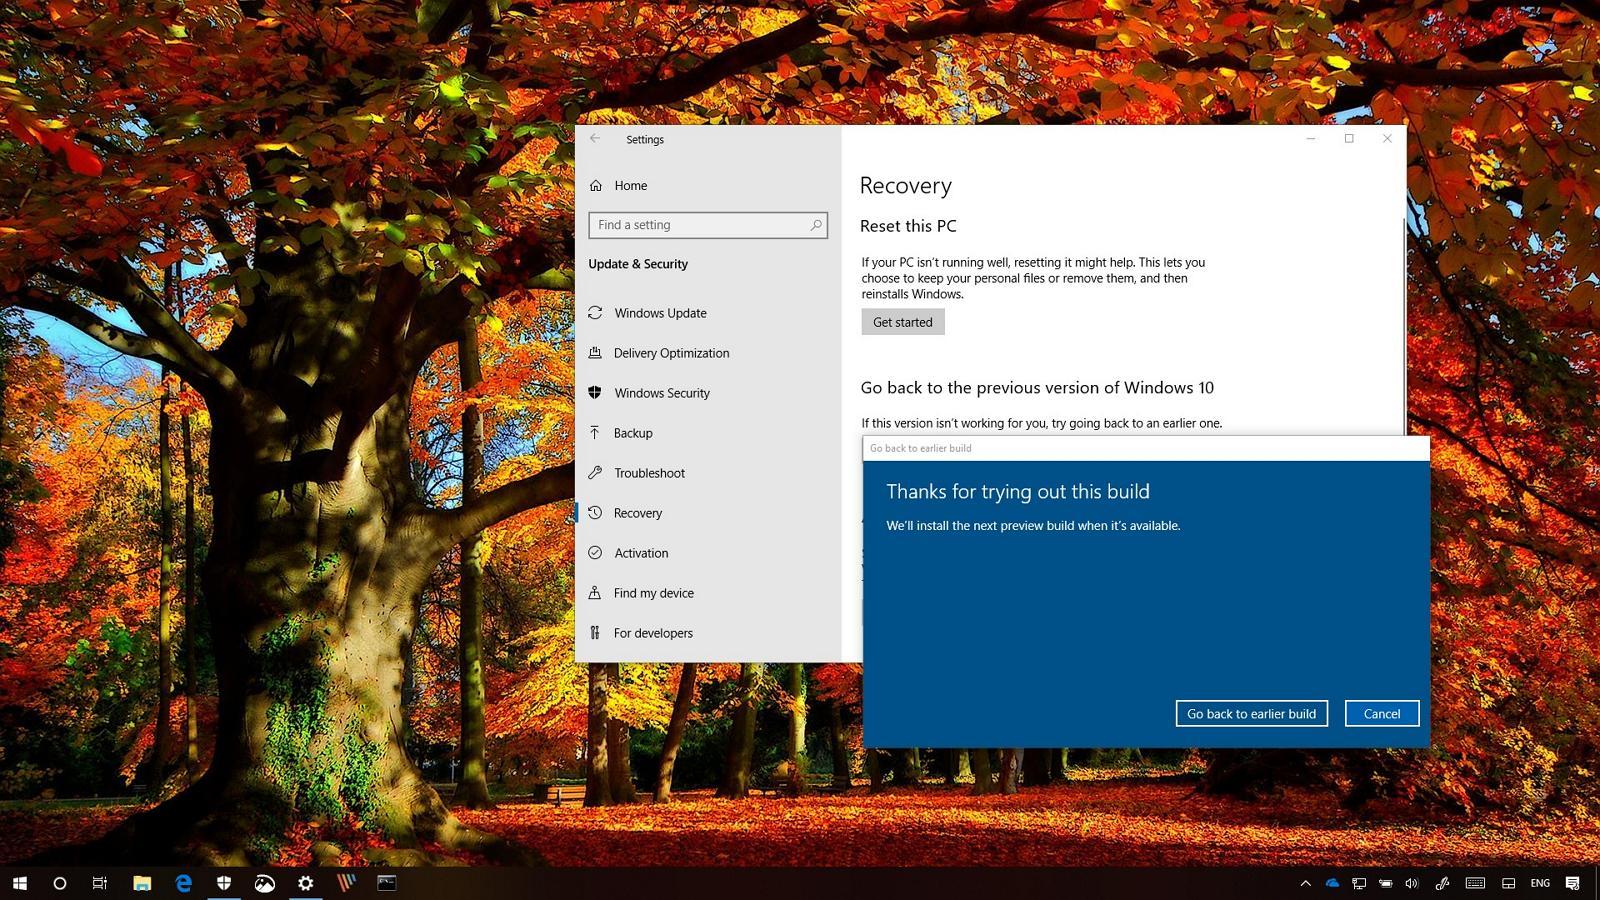 Uninstall Windows 10 October 2018 Update (version 1809)